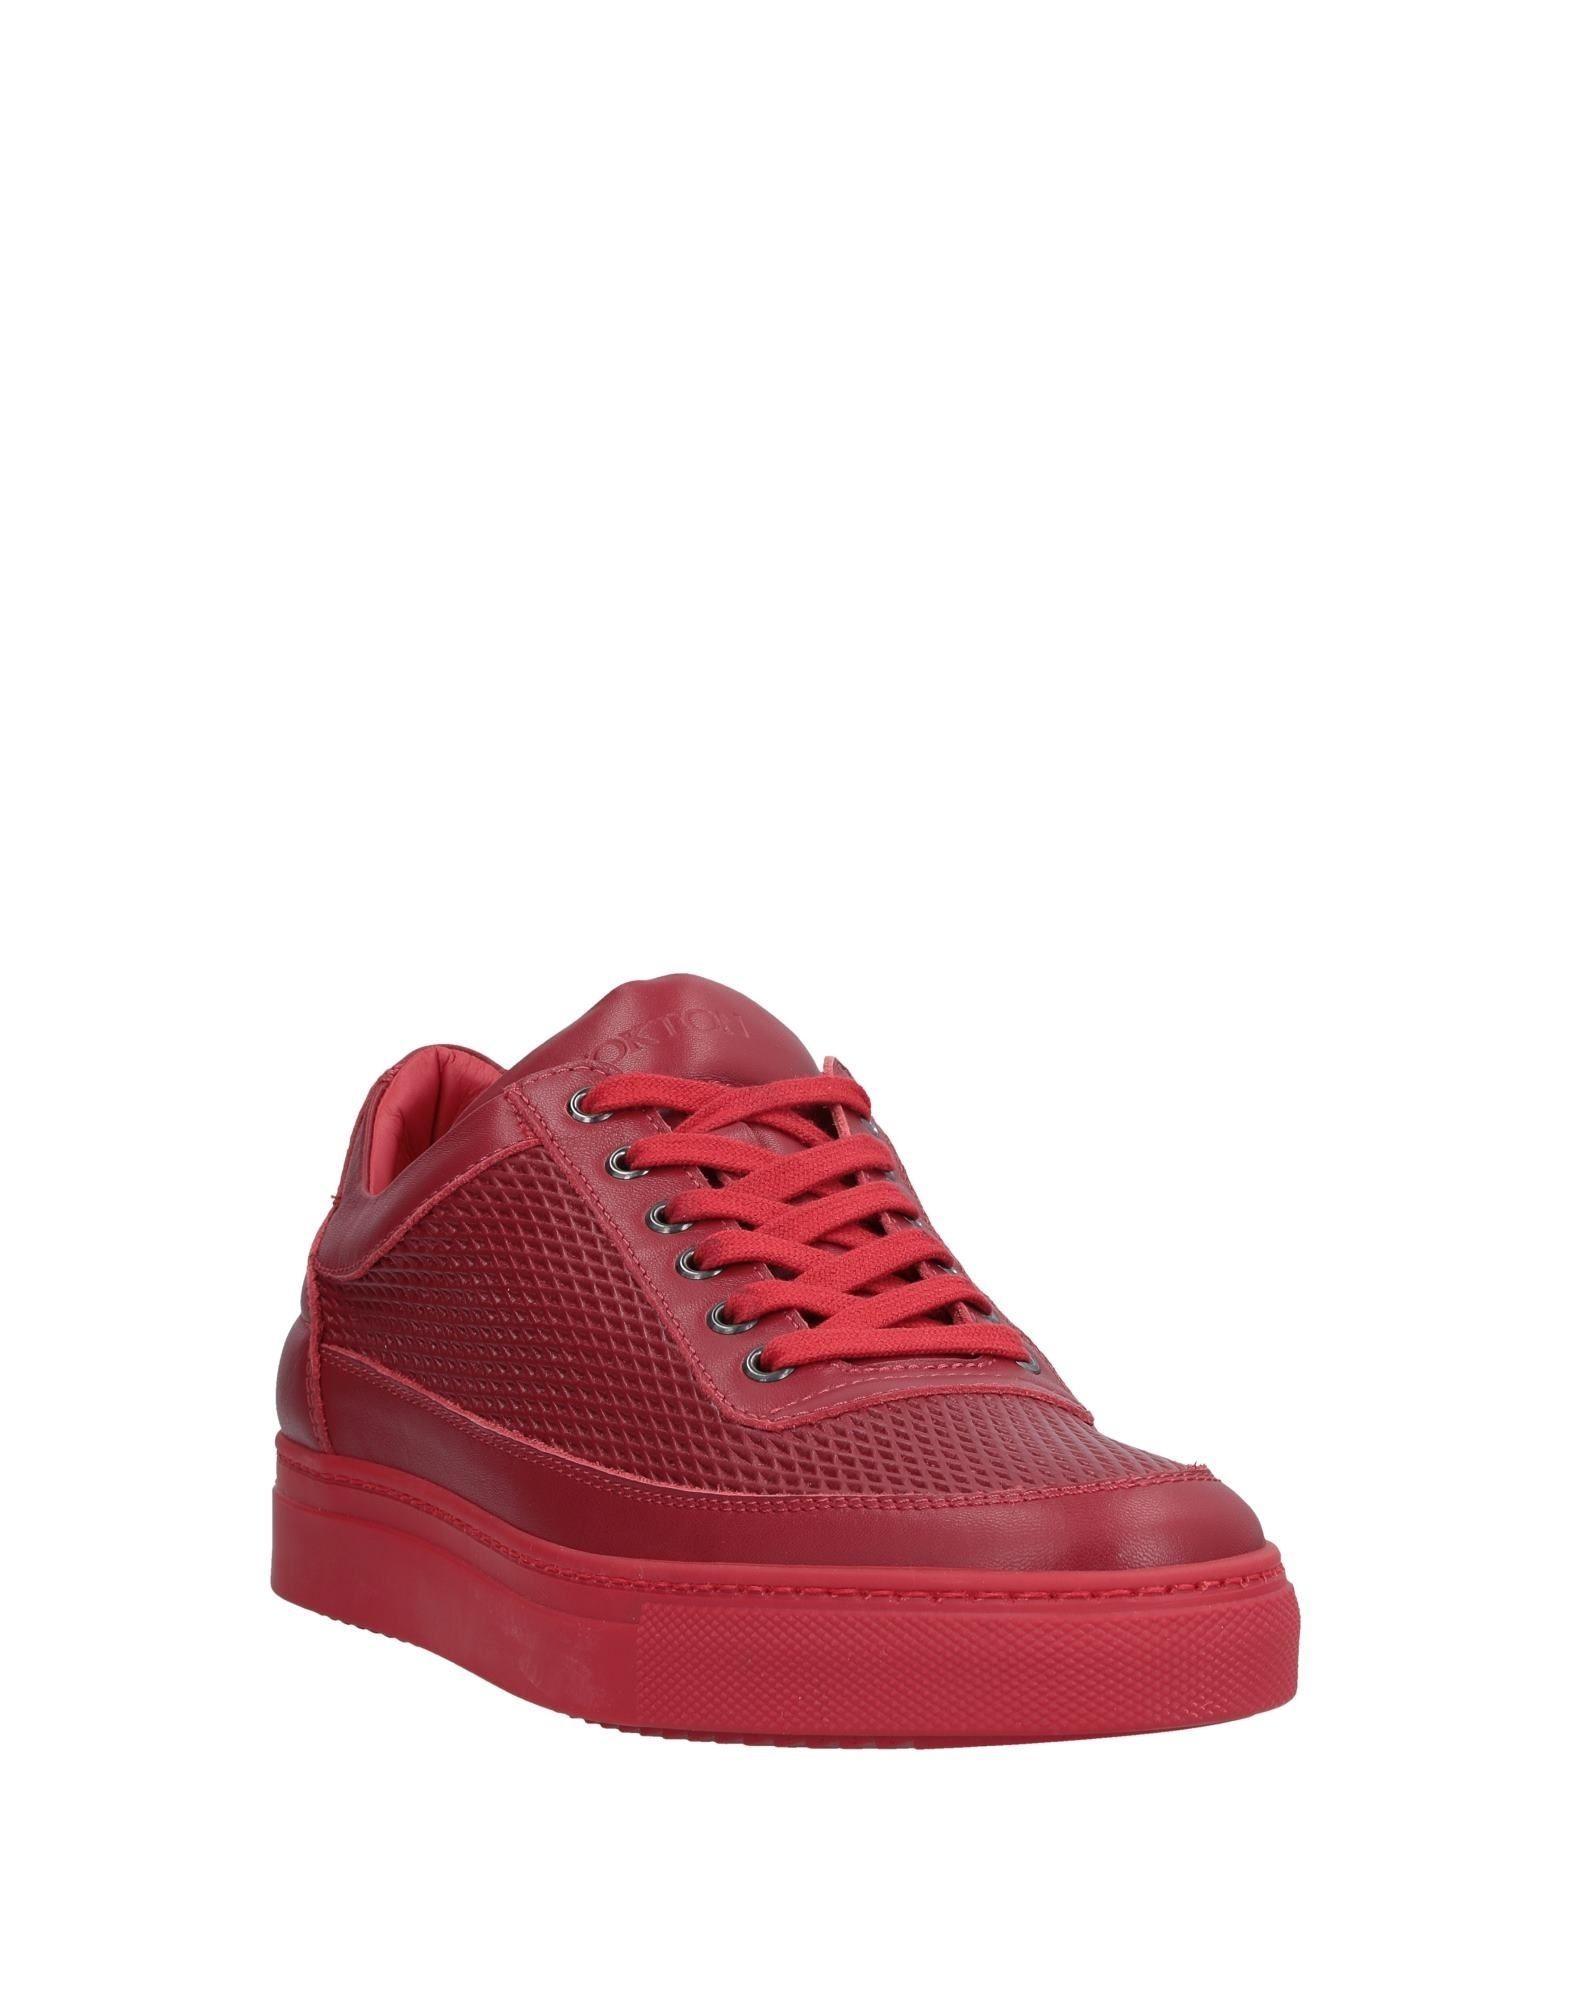 Stokton Sneakers - Men Stokton Sneakers Sneakers Sneakers online on  Australia - 11537653TF bc8b52